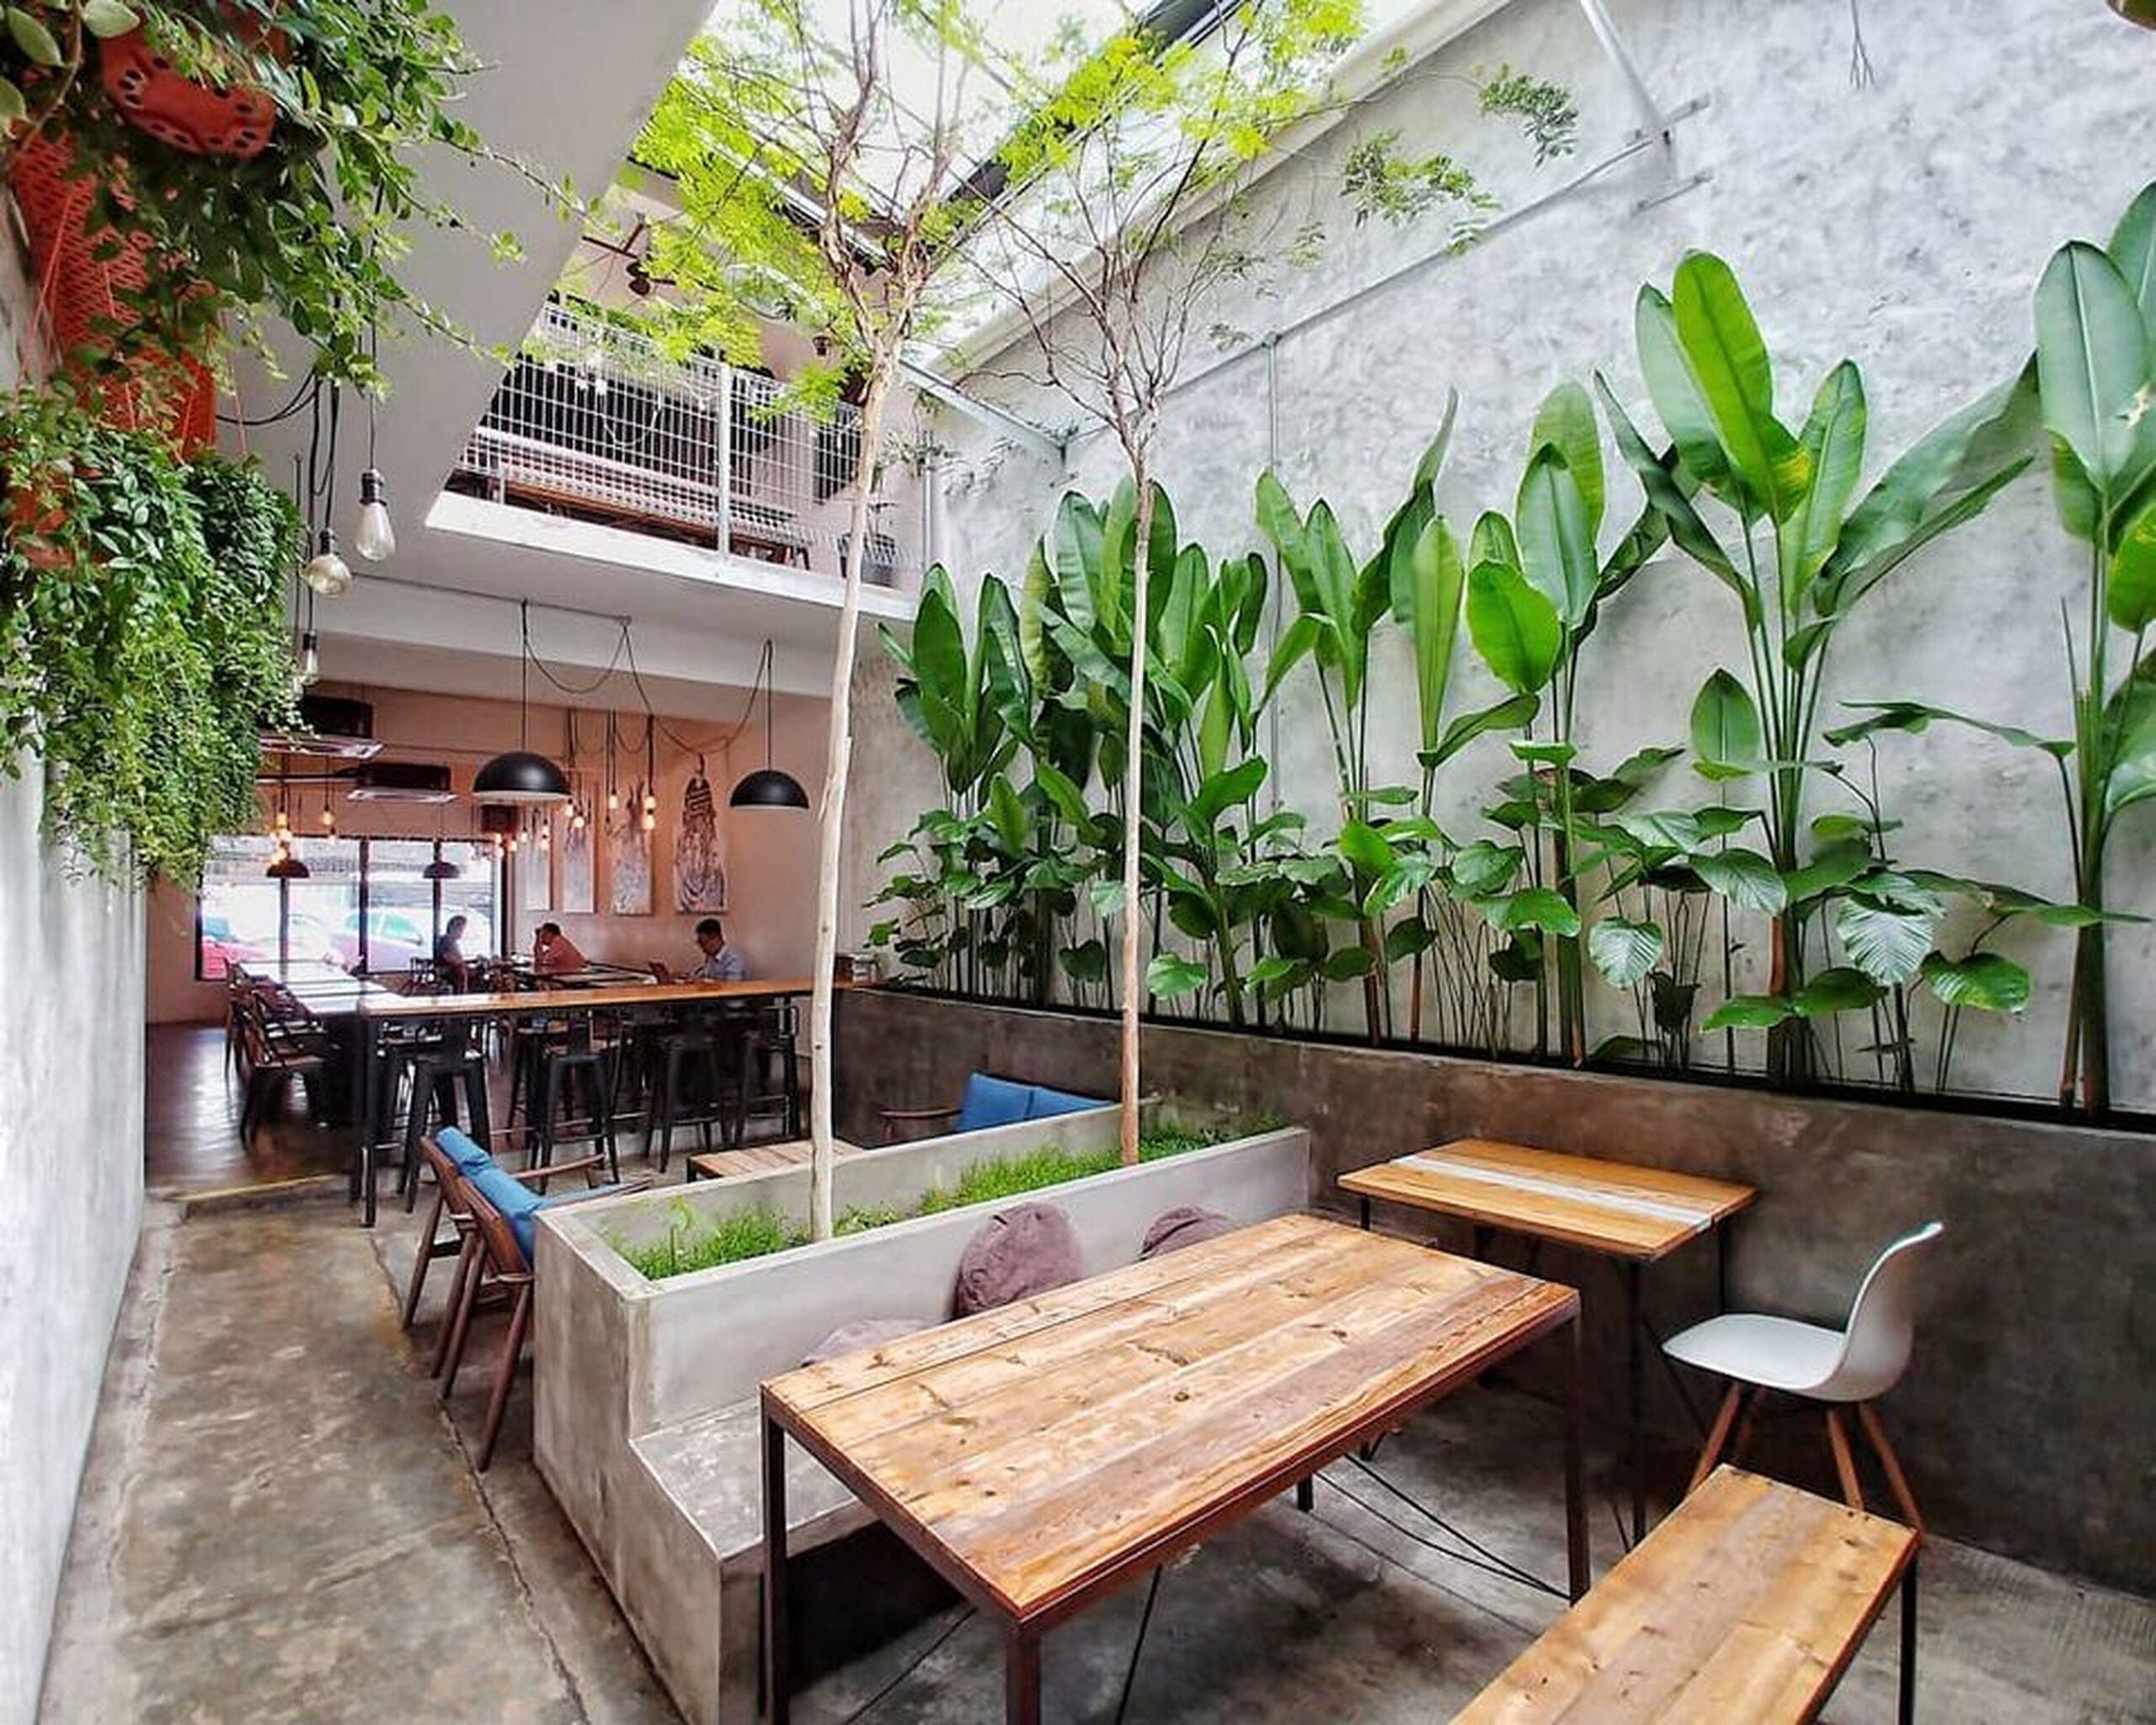 UNIQUE INSTAGRAMMABLE CAFES IN SELANGOR 13